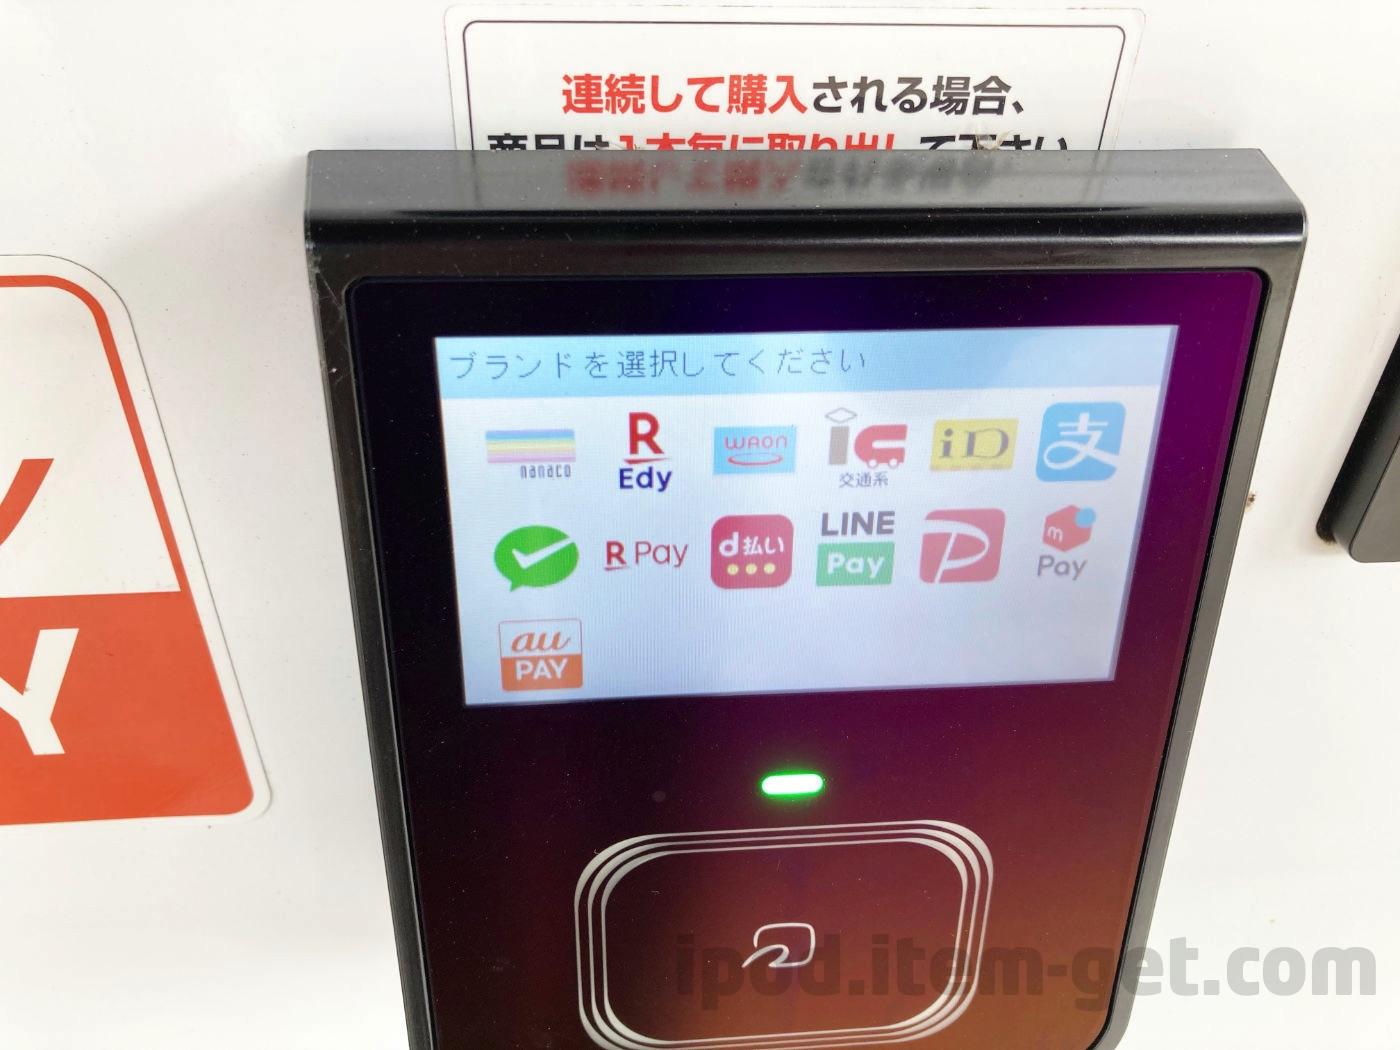 QRcode jihanki vendingmachine 01